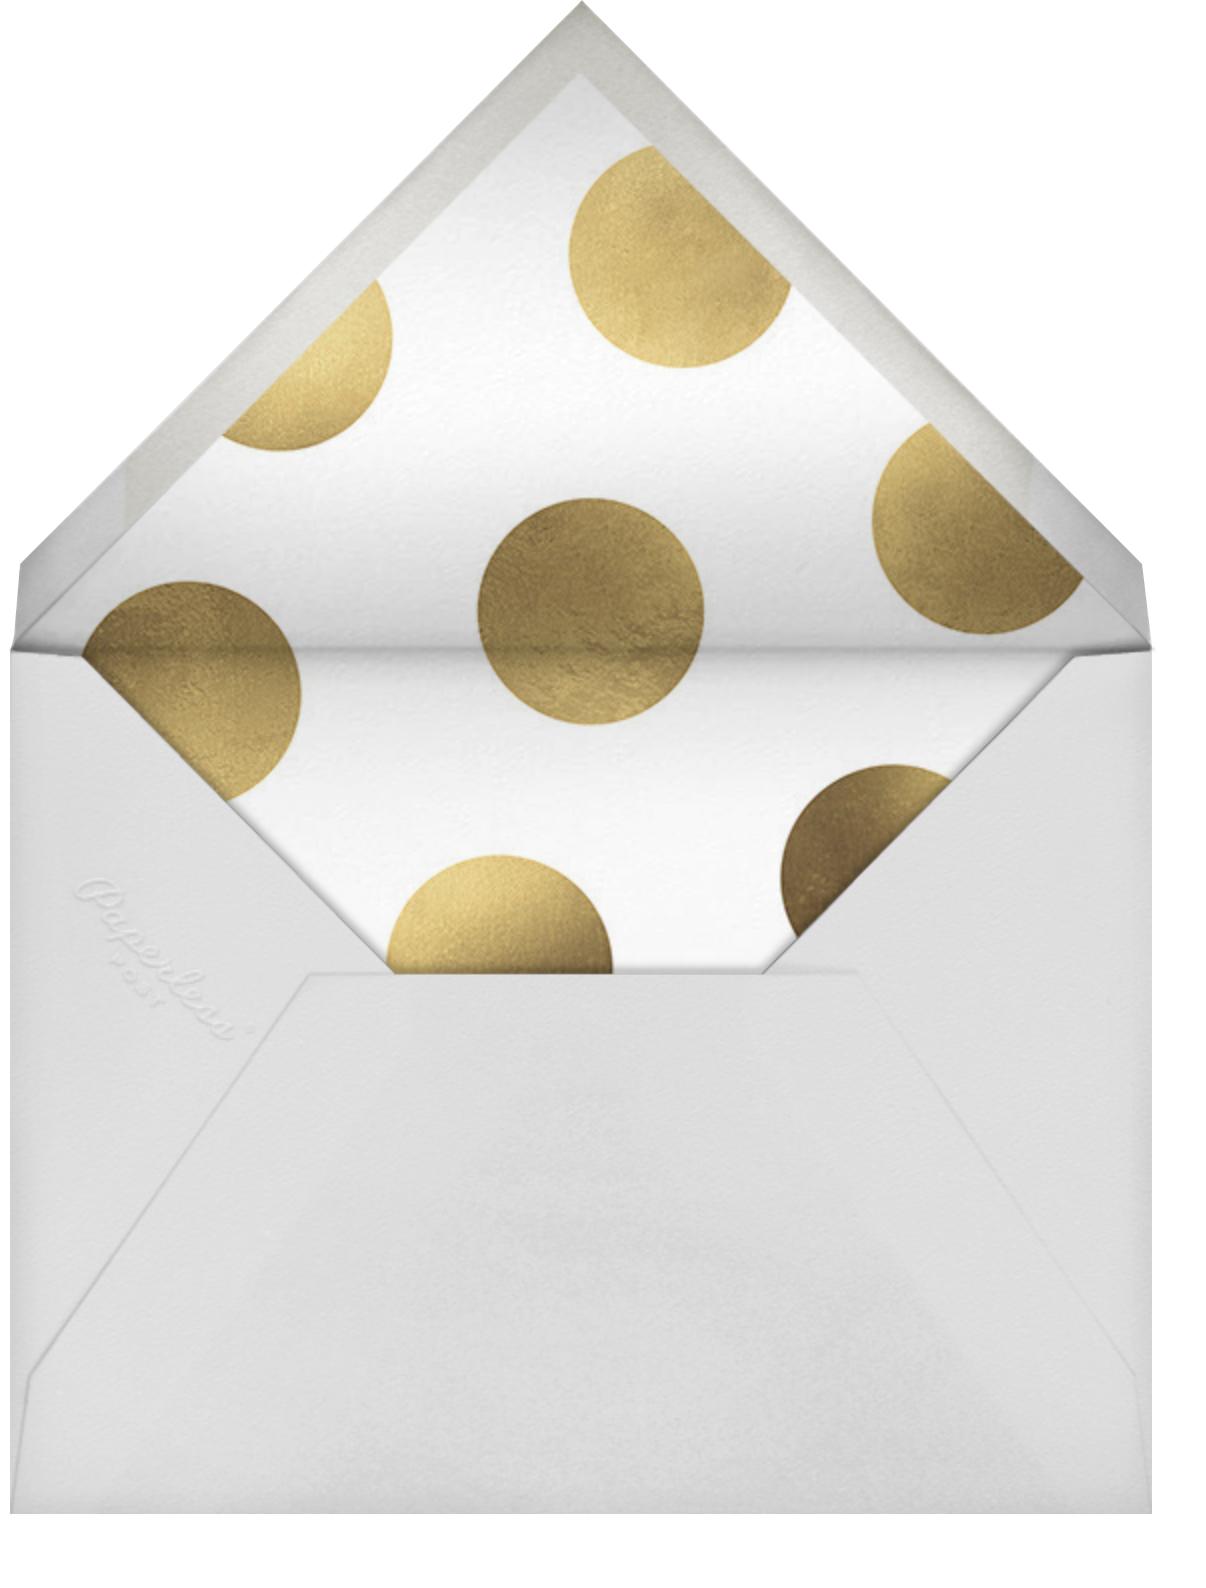 Celebration Dots - Charcoal/Gold - Sugar Paper - Cocktail party - envelope back